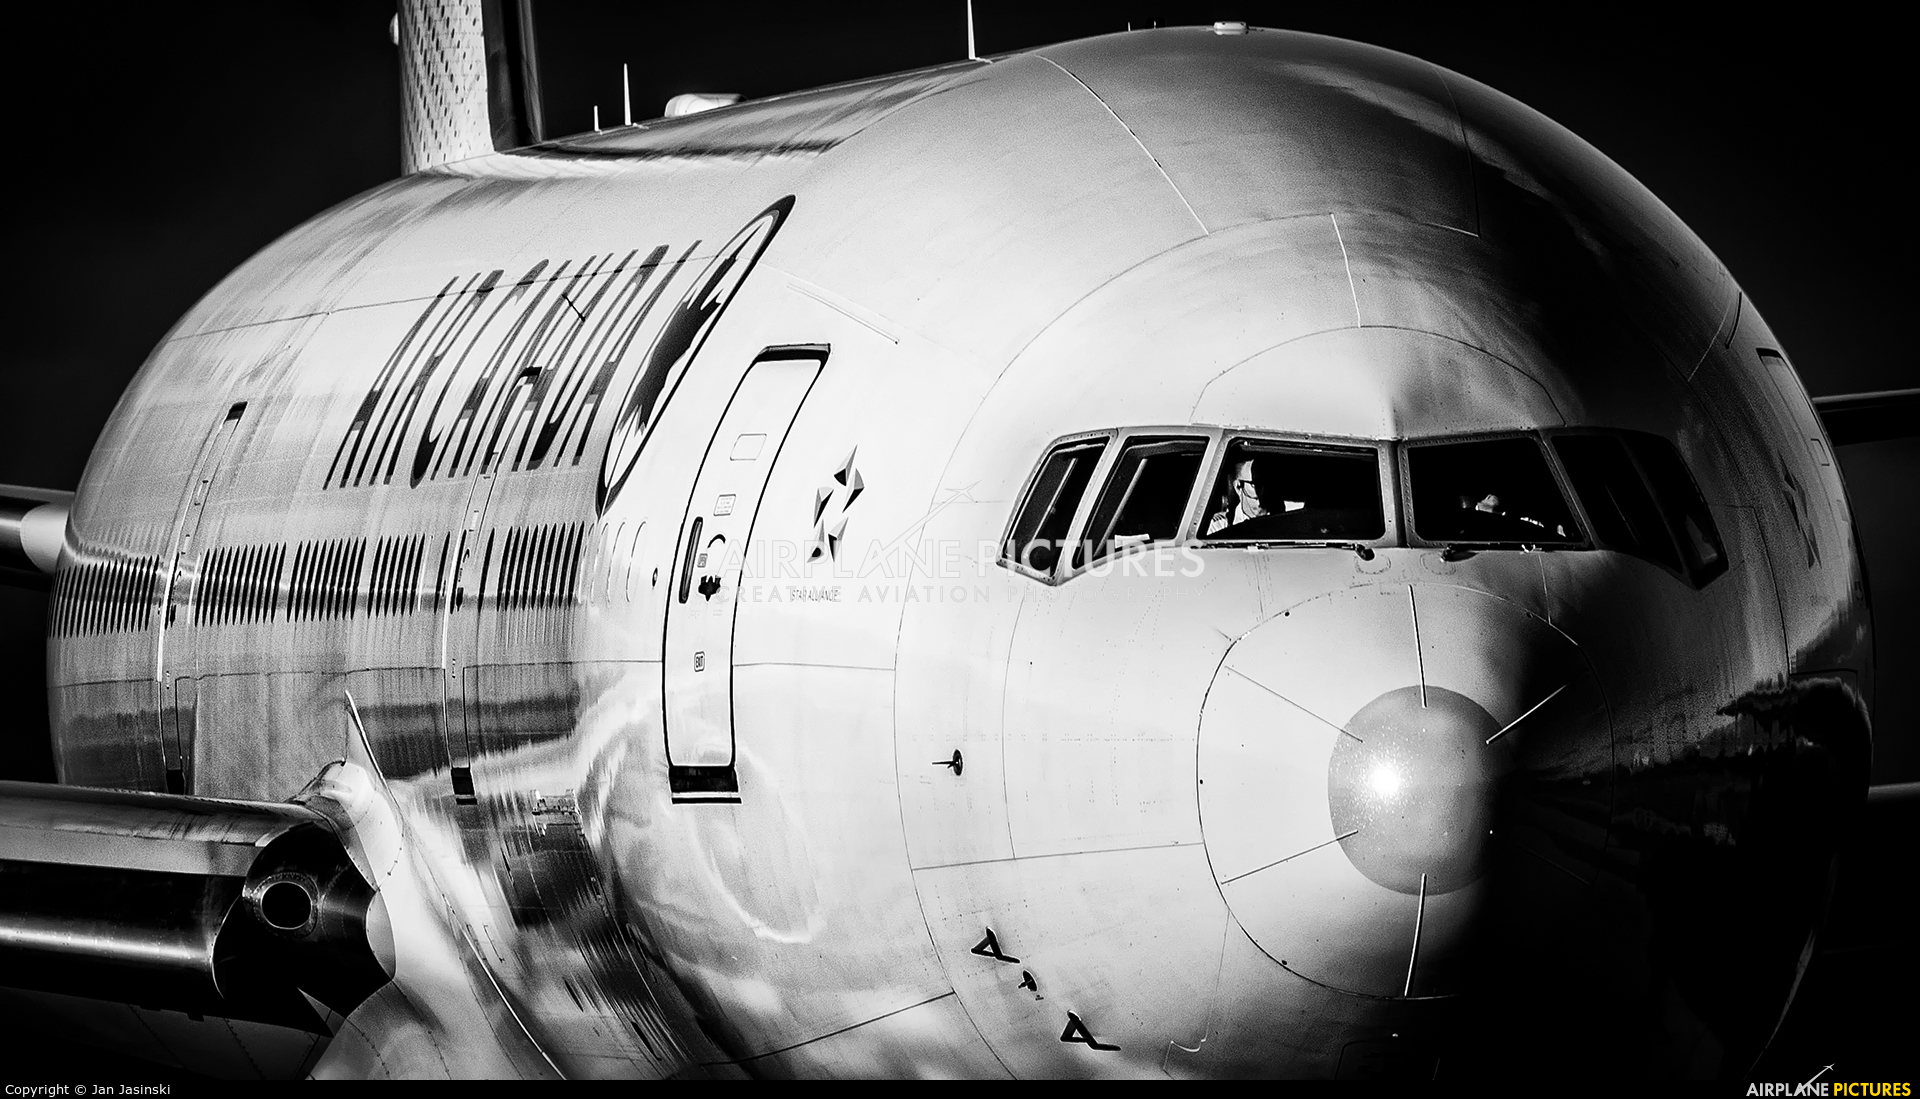 Air Canada C-FIUA aircraft at Toronto - Pearson Intl, ON